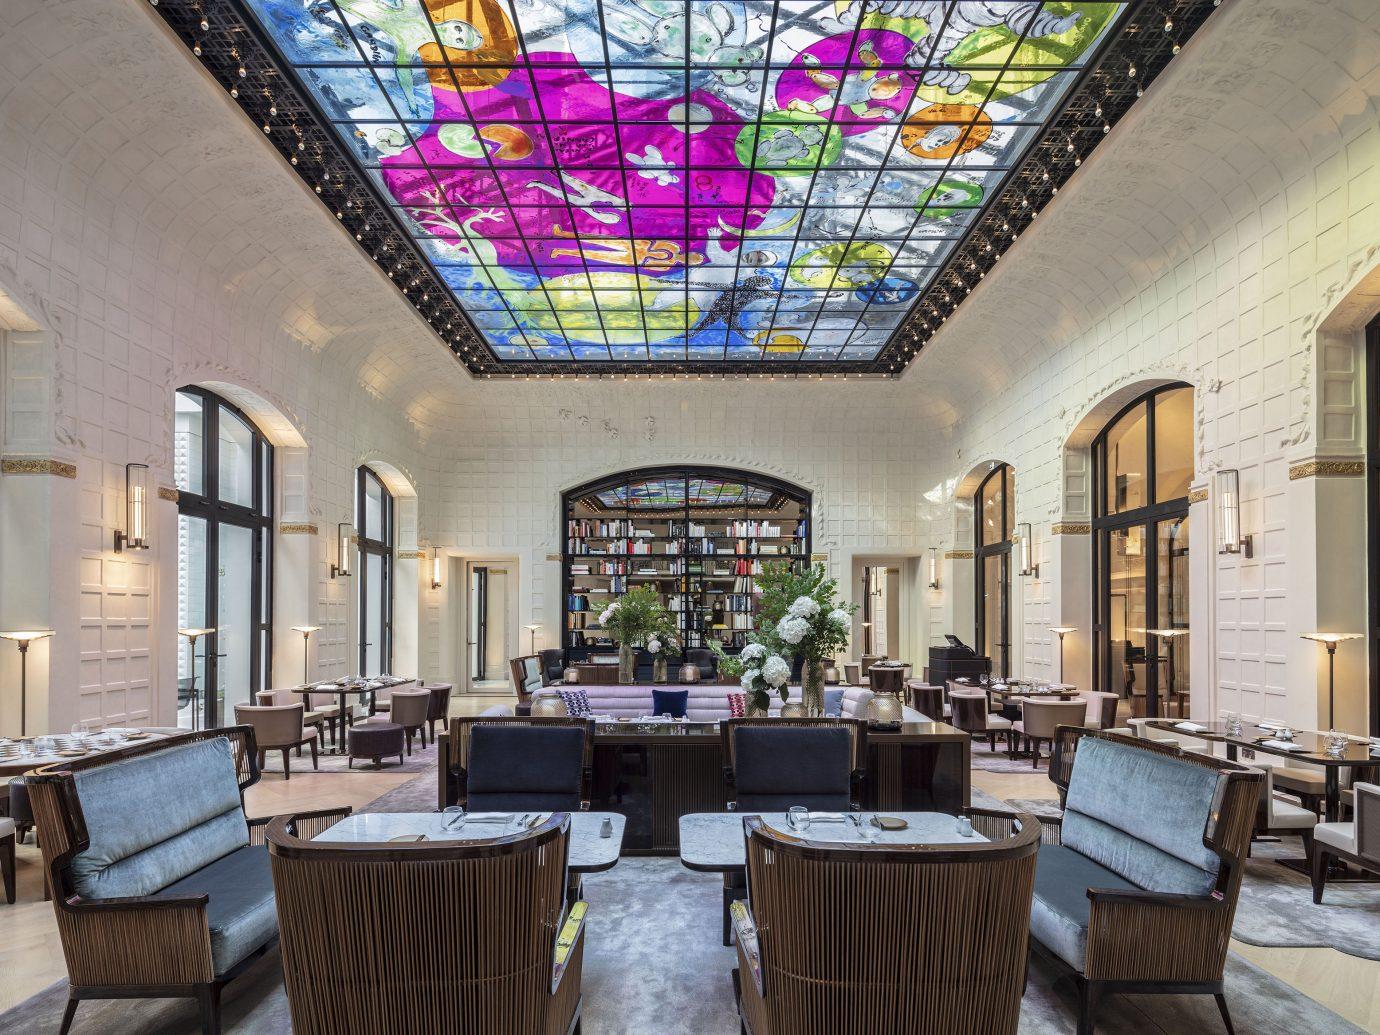 Saint Germain restaurant at Hotel Lutetia